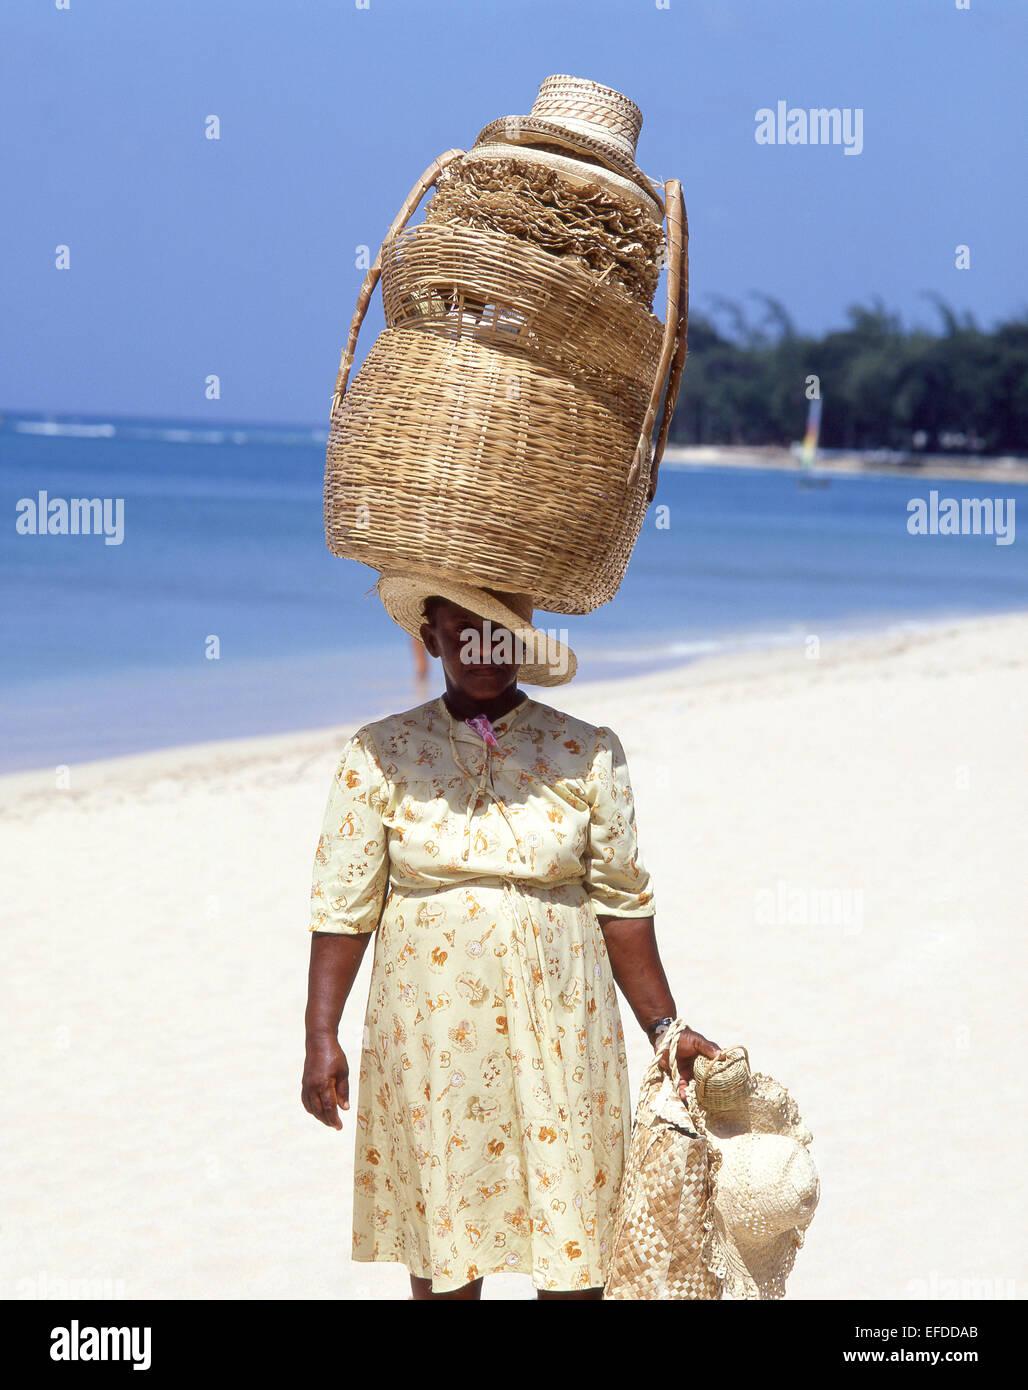 Woman basket seller on beach, Sandy Lane Beach, Saint James Parish, Barbados, Lesser Antilles, Caribbean - Stock Image